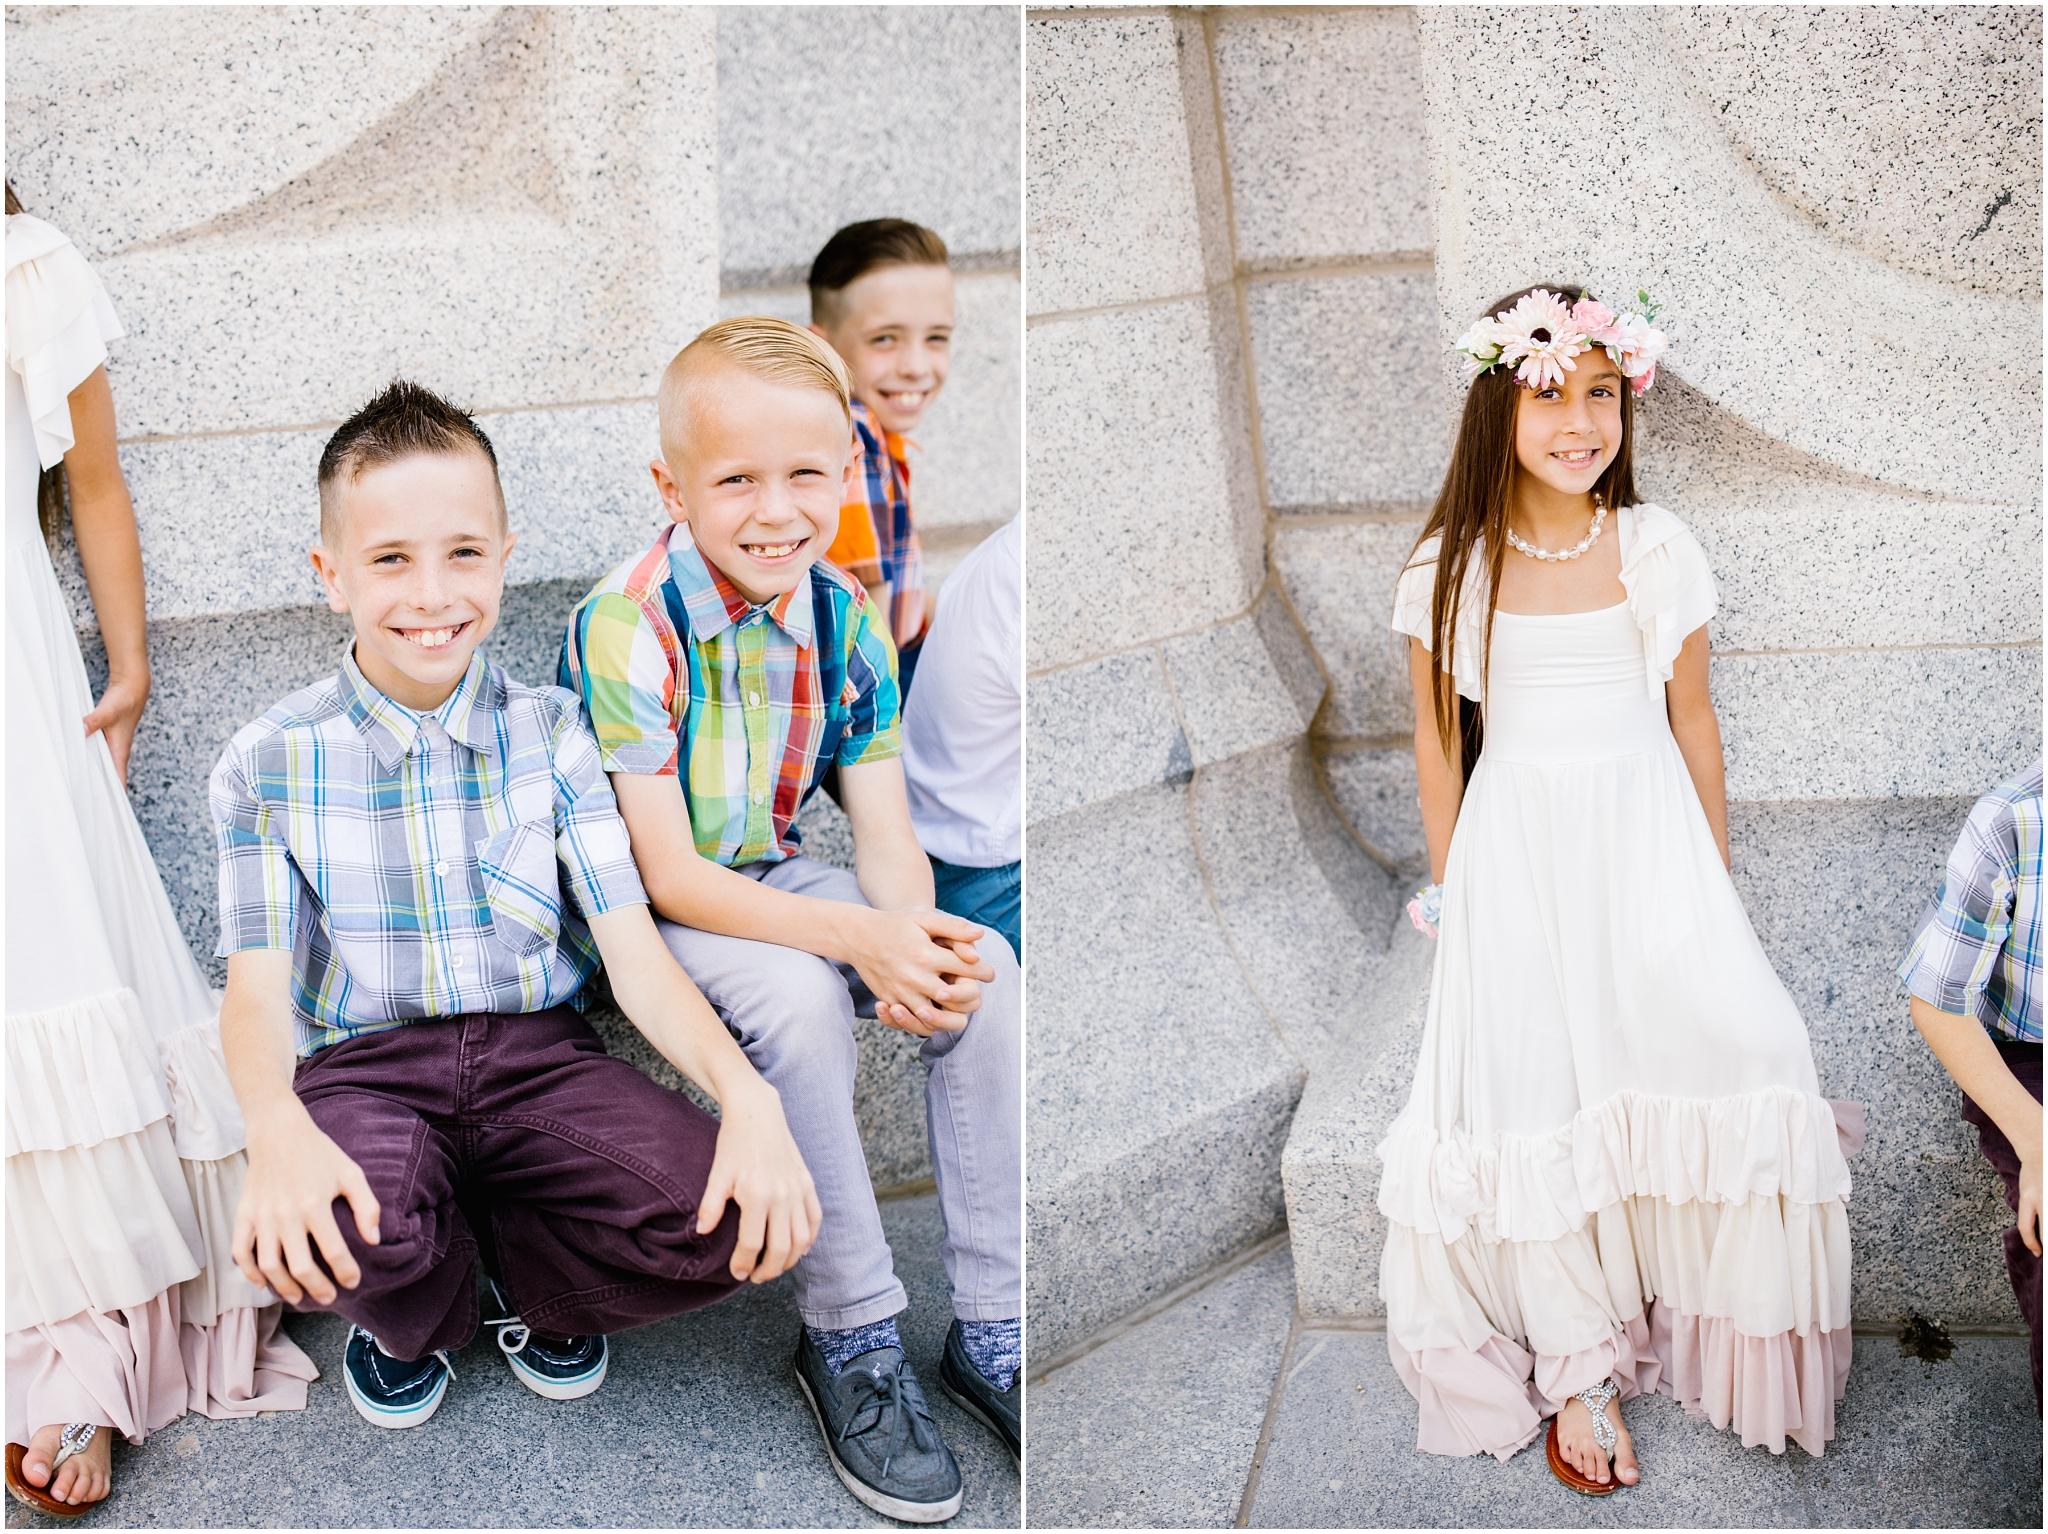 CherylandTyler-30_Lizzie-B-Imagery-Utah-Wedding-Photographer-Salt-Lake-City-Temple-Wells-Fargo-Building-Reception.jpg